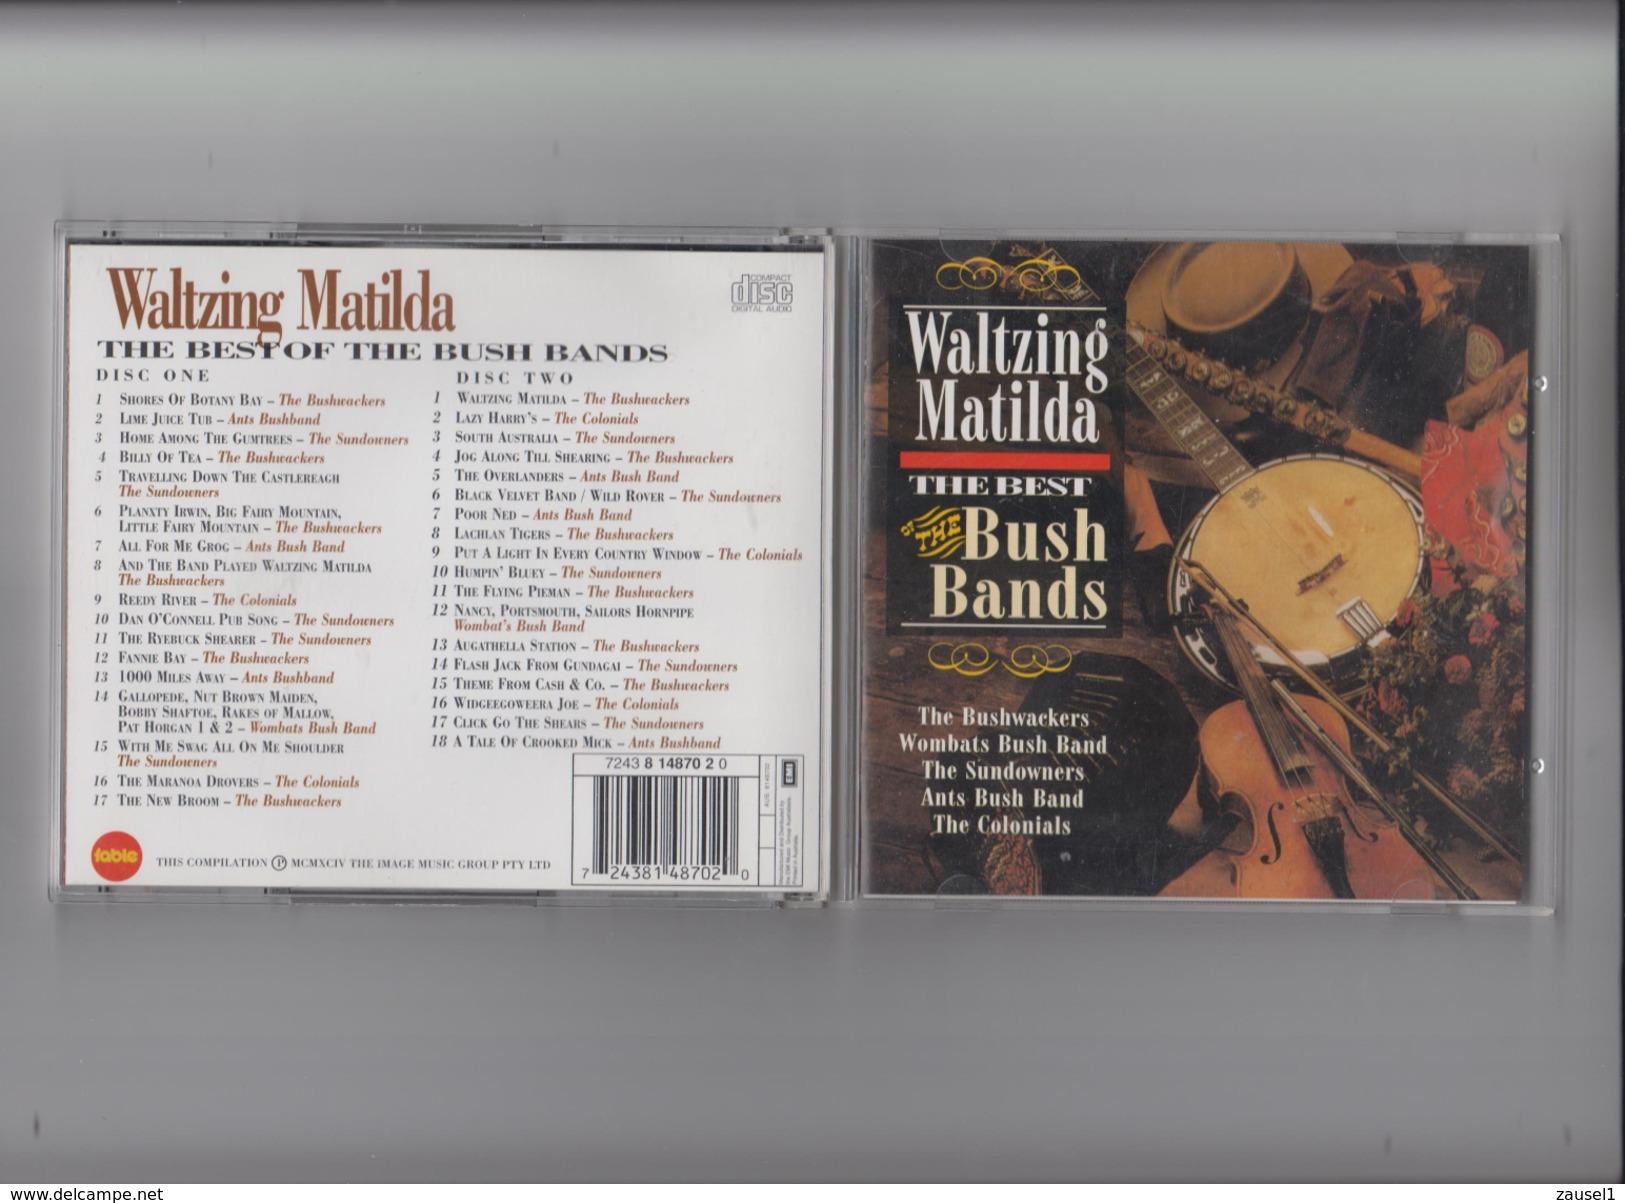 Waltzing Matilda - The Best Bushbands - 2 Original CDs - Titel Ansehen !!! - Country & Folk